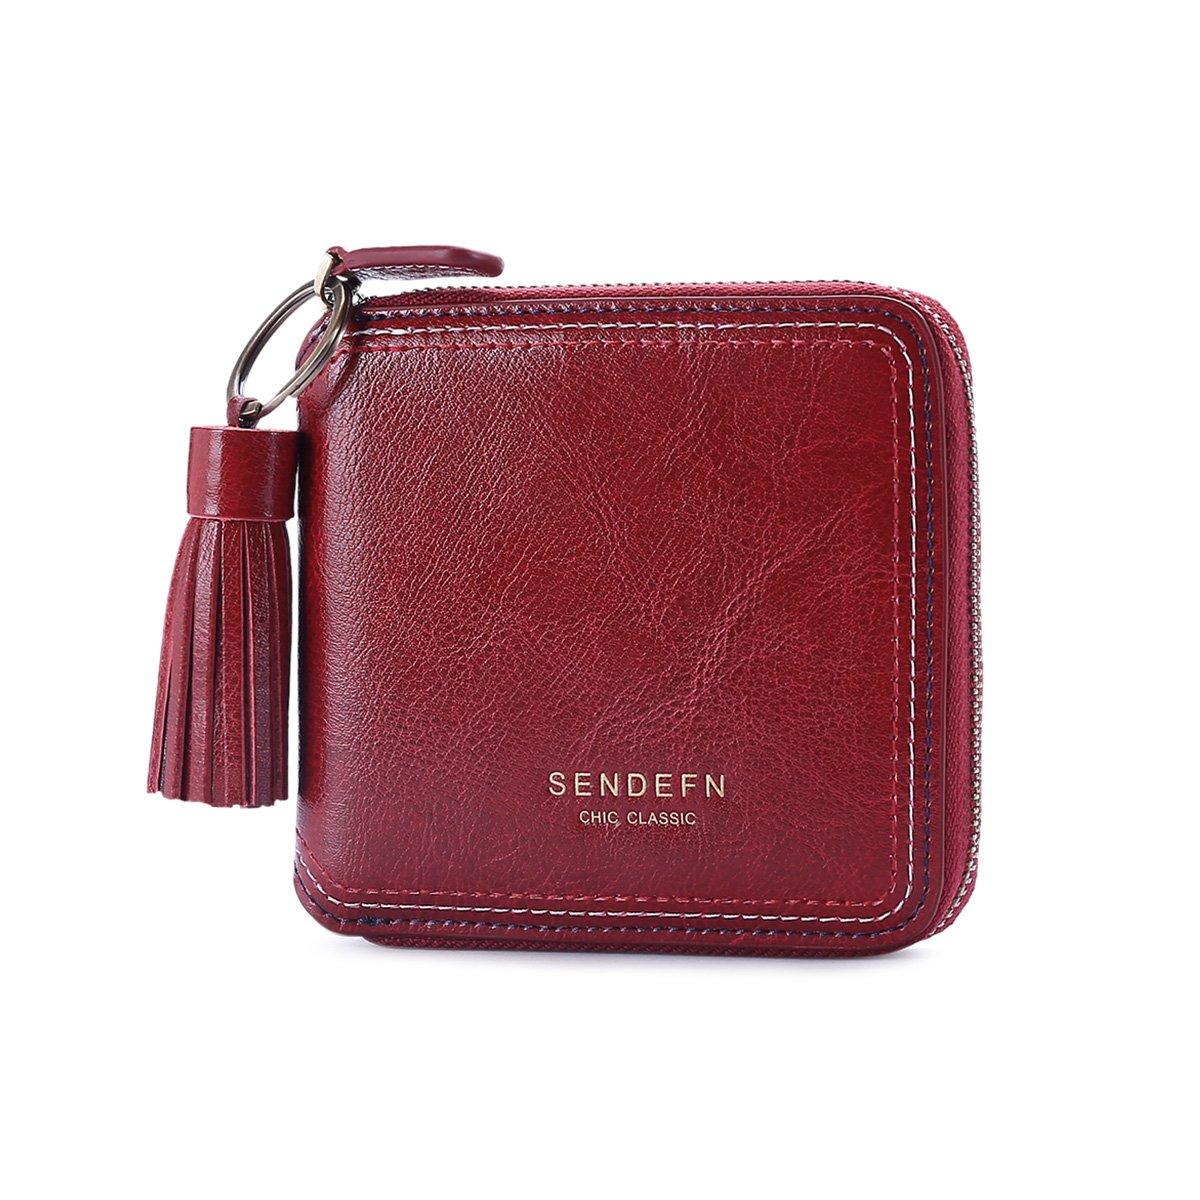 Mini Tassel Short Women Wallet Lady Coin Pocket Card Holder Phone Purse For Female